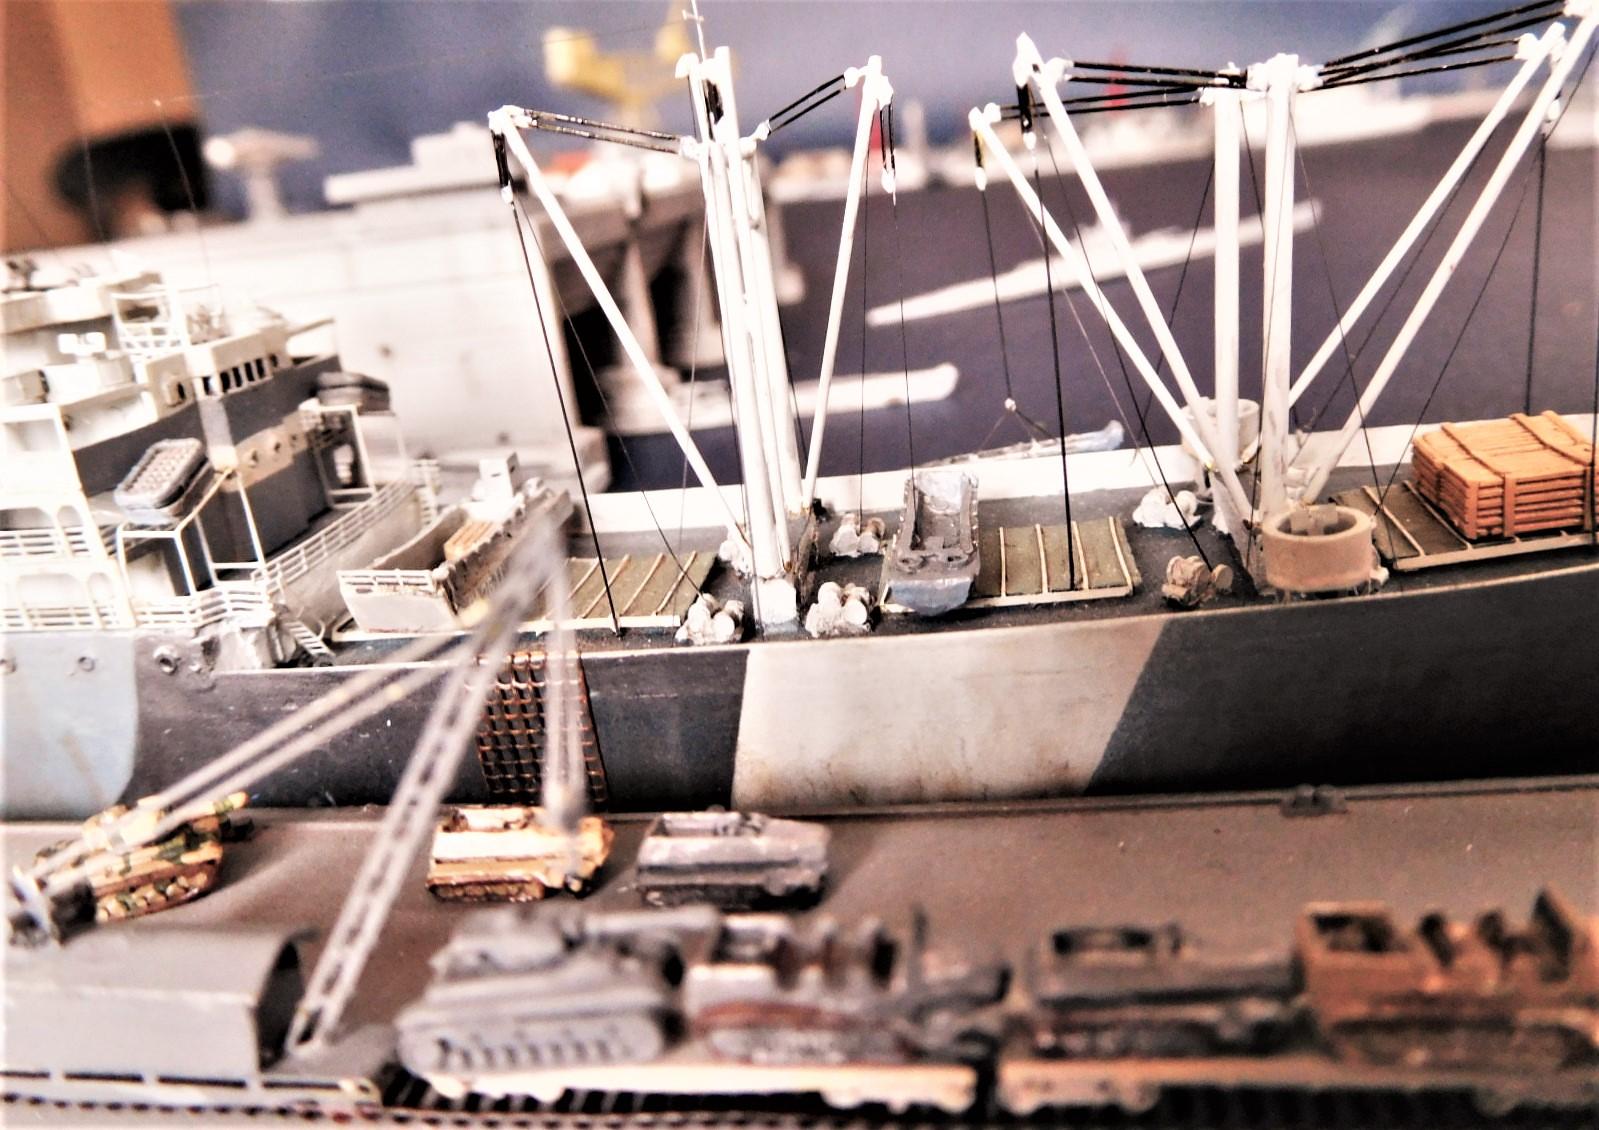 Diorama base navale 1/700 par Nesquik - Page 4 Y5oZKeG